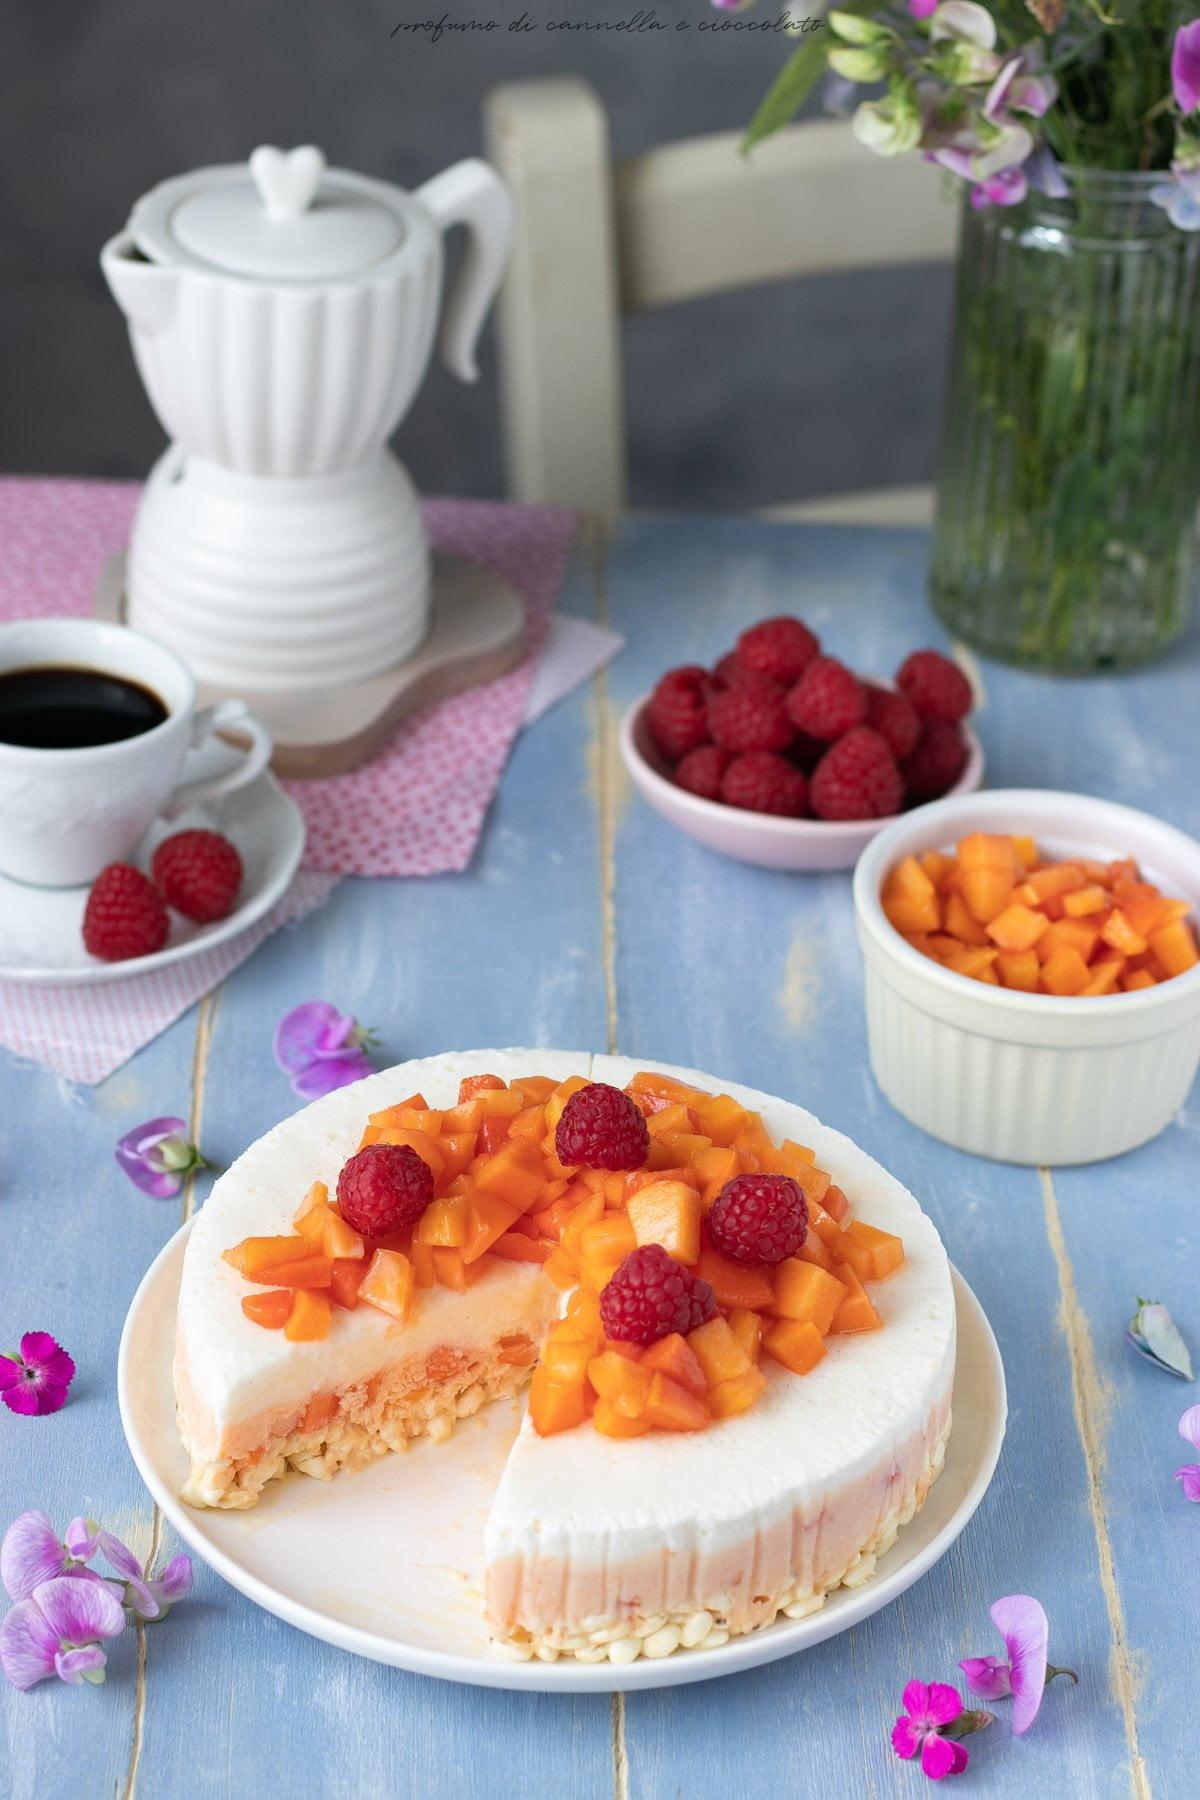 Torta gelato alla papaya